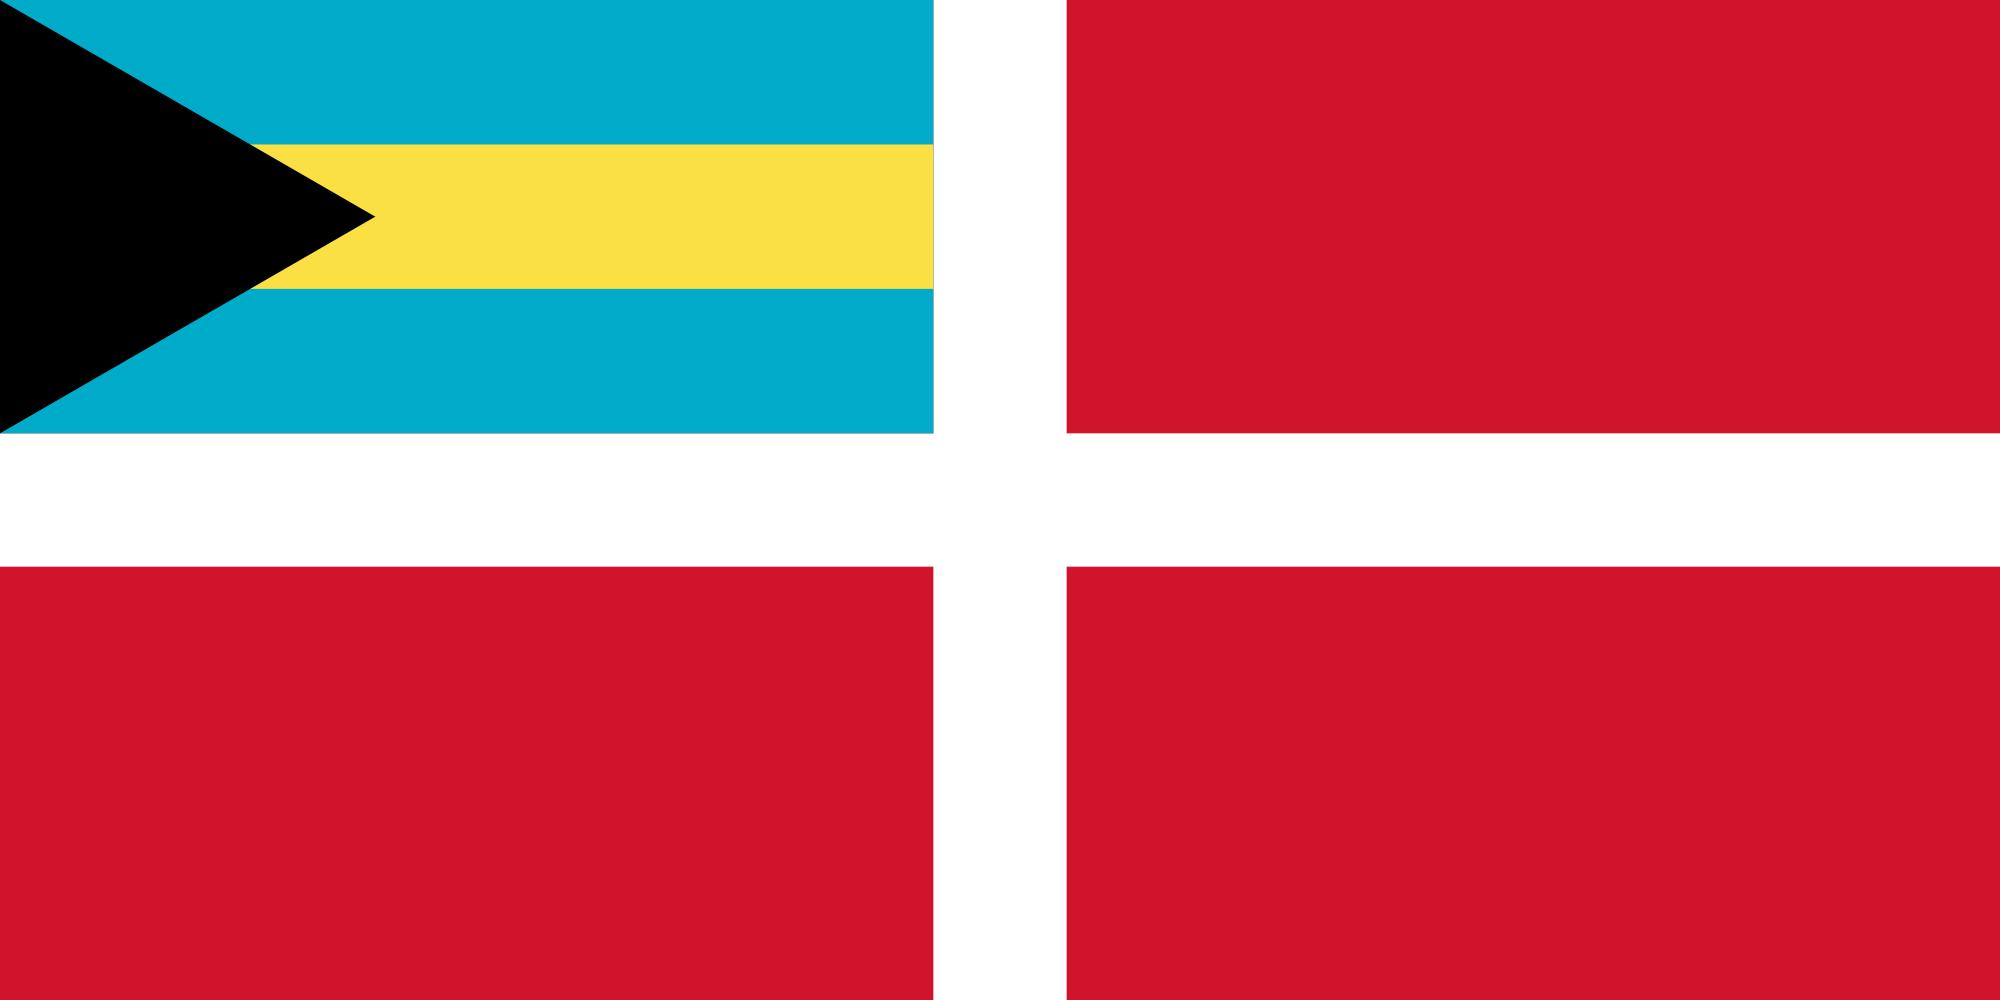 Bahamas (Civil ensign)